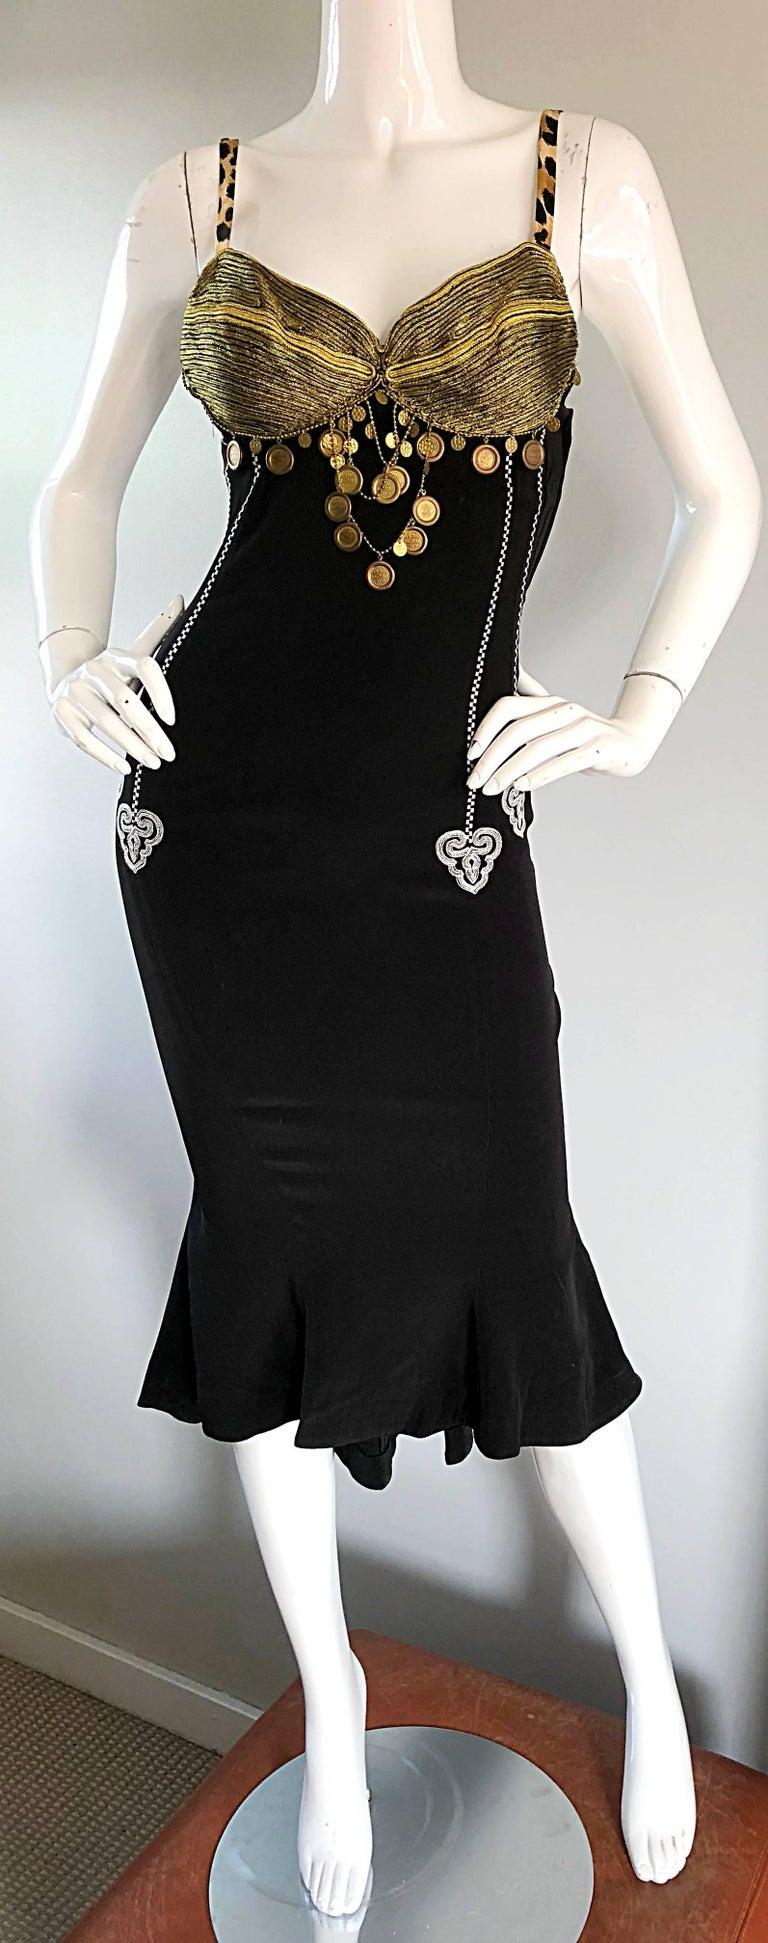 1980s Rifat Ozbek Sz 8 Black White Leopard Print Coin Embellished Mermaid Dress For Sale 1